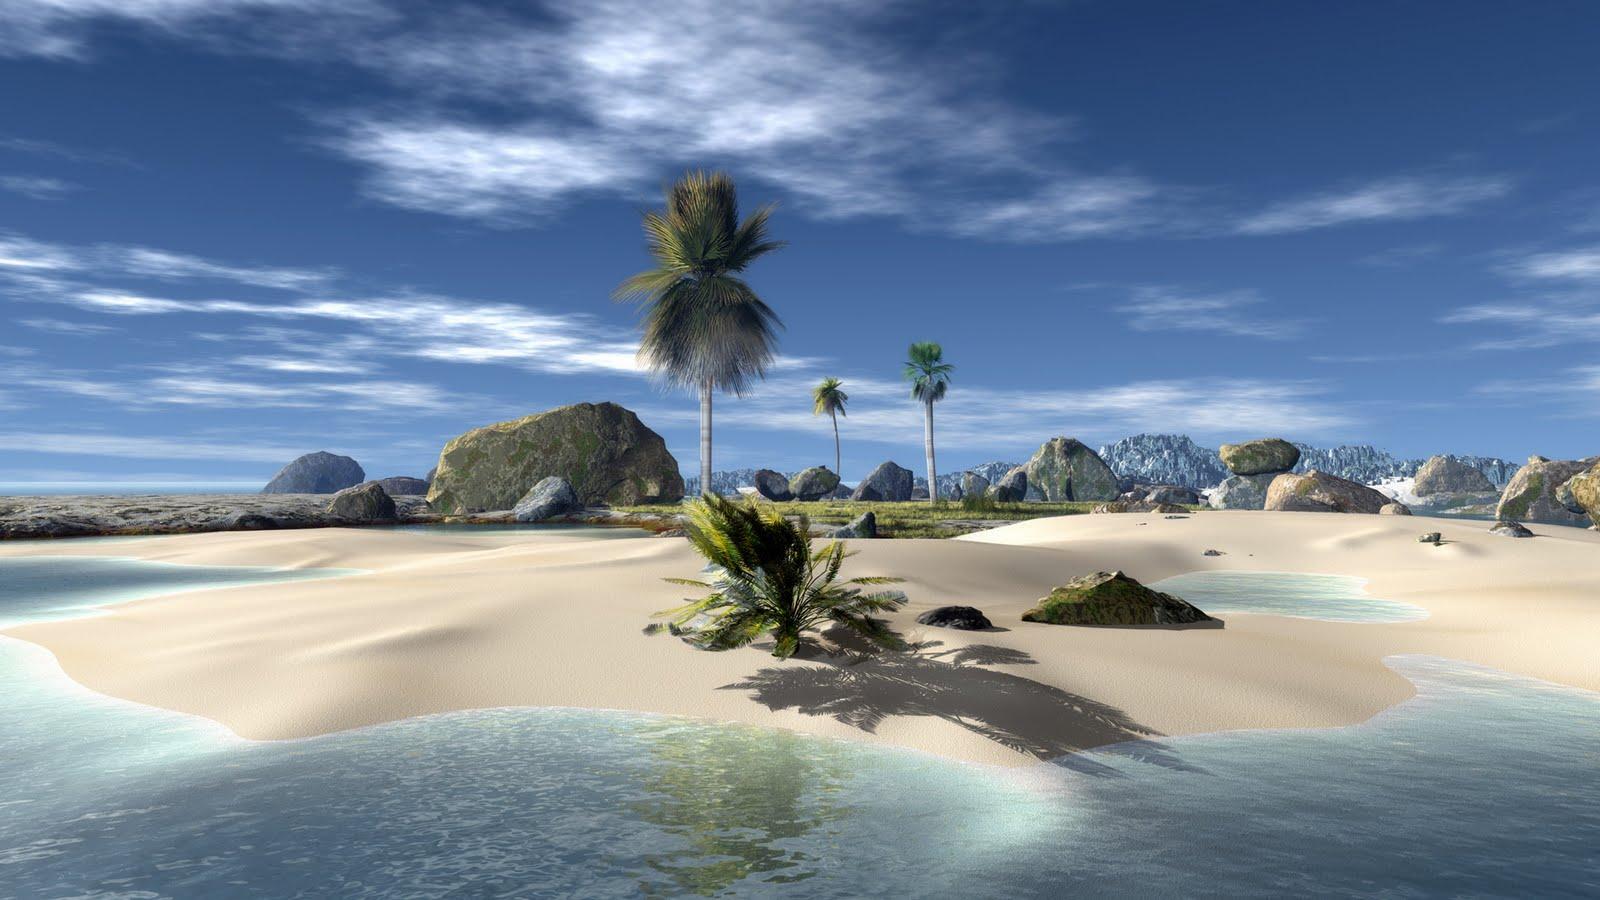 Tropical Paradise Beach Hd Wallpaper For Nexus 7 Screens: Widescreen Paradise Beach